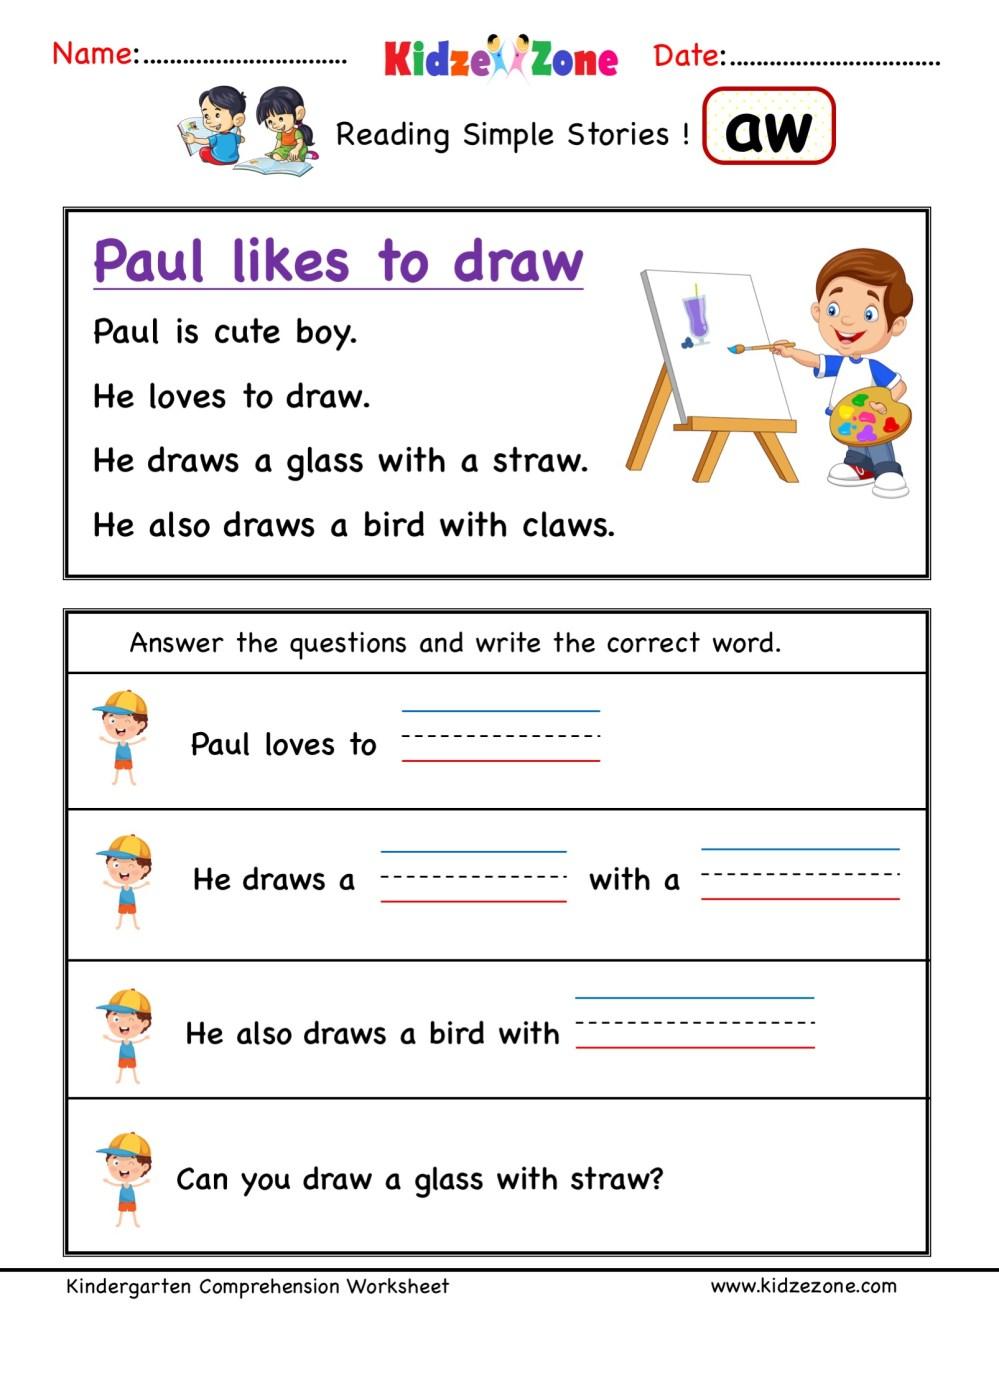 medium resolution of aw word family Kindergarten Reading Comprehension #3 - KidzeZone